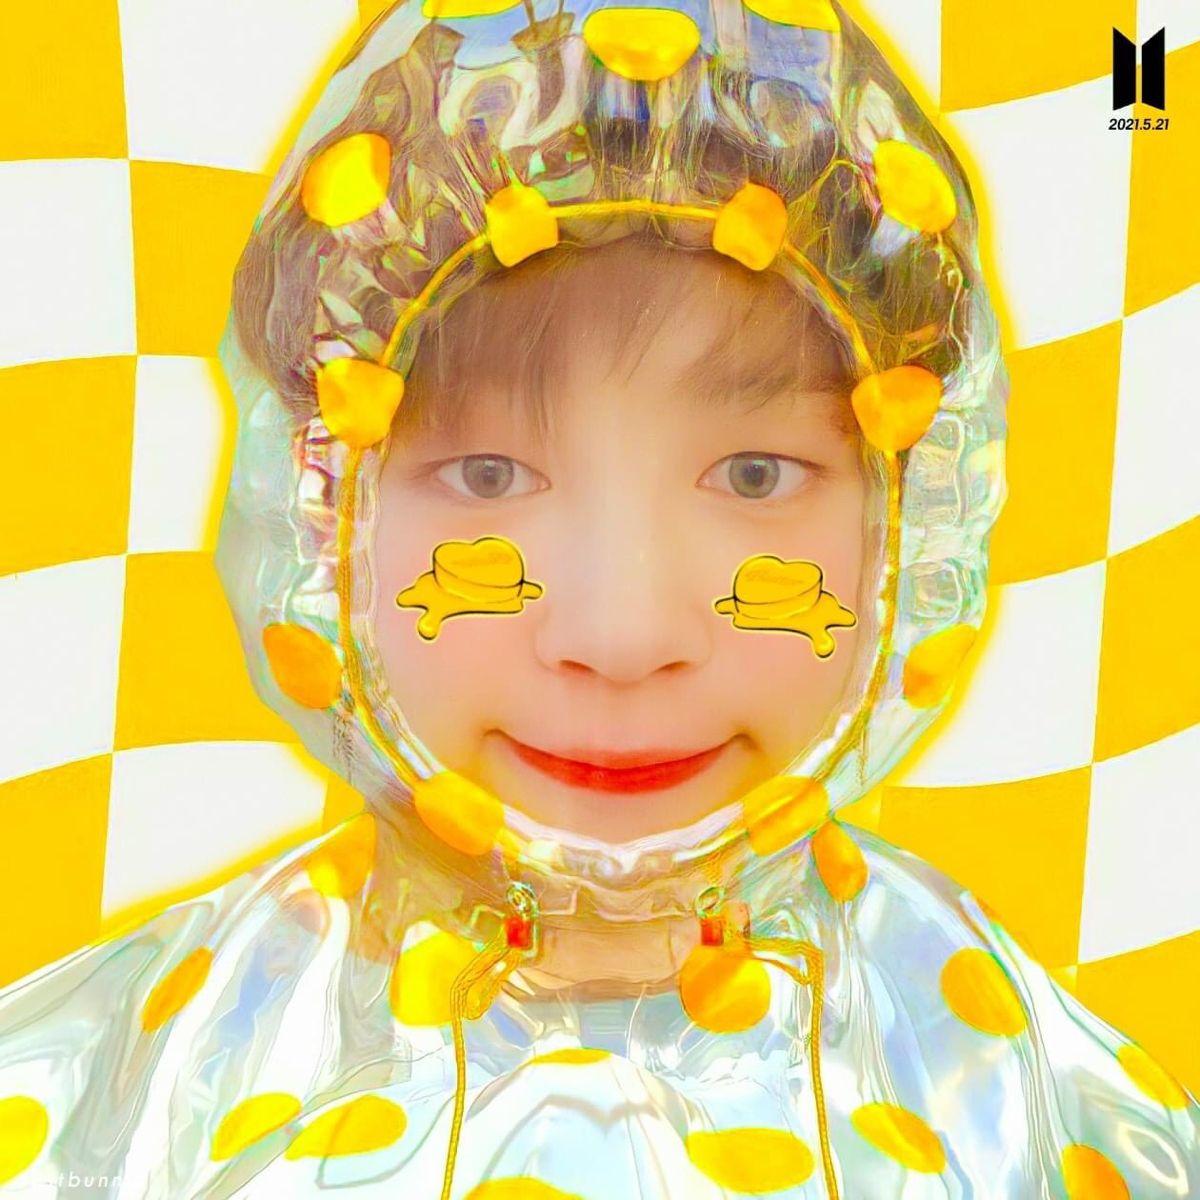 Jimin Butter Era In 2021 Park Jimin Cute Cute Jimin Bts Funny Bts wallpaper butter era